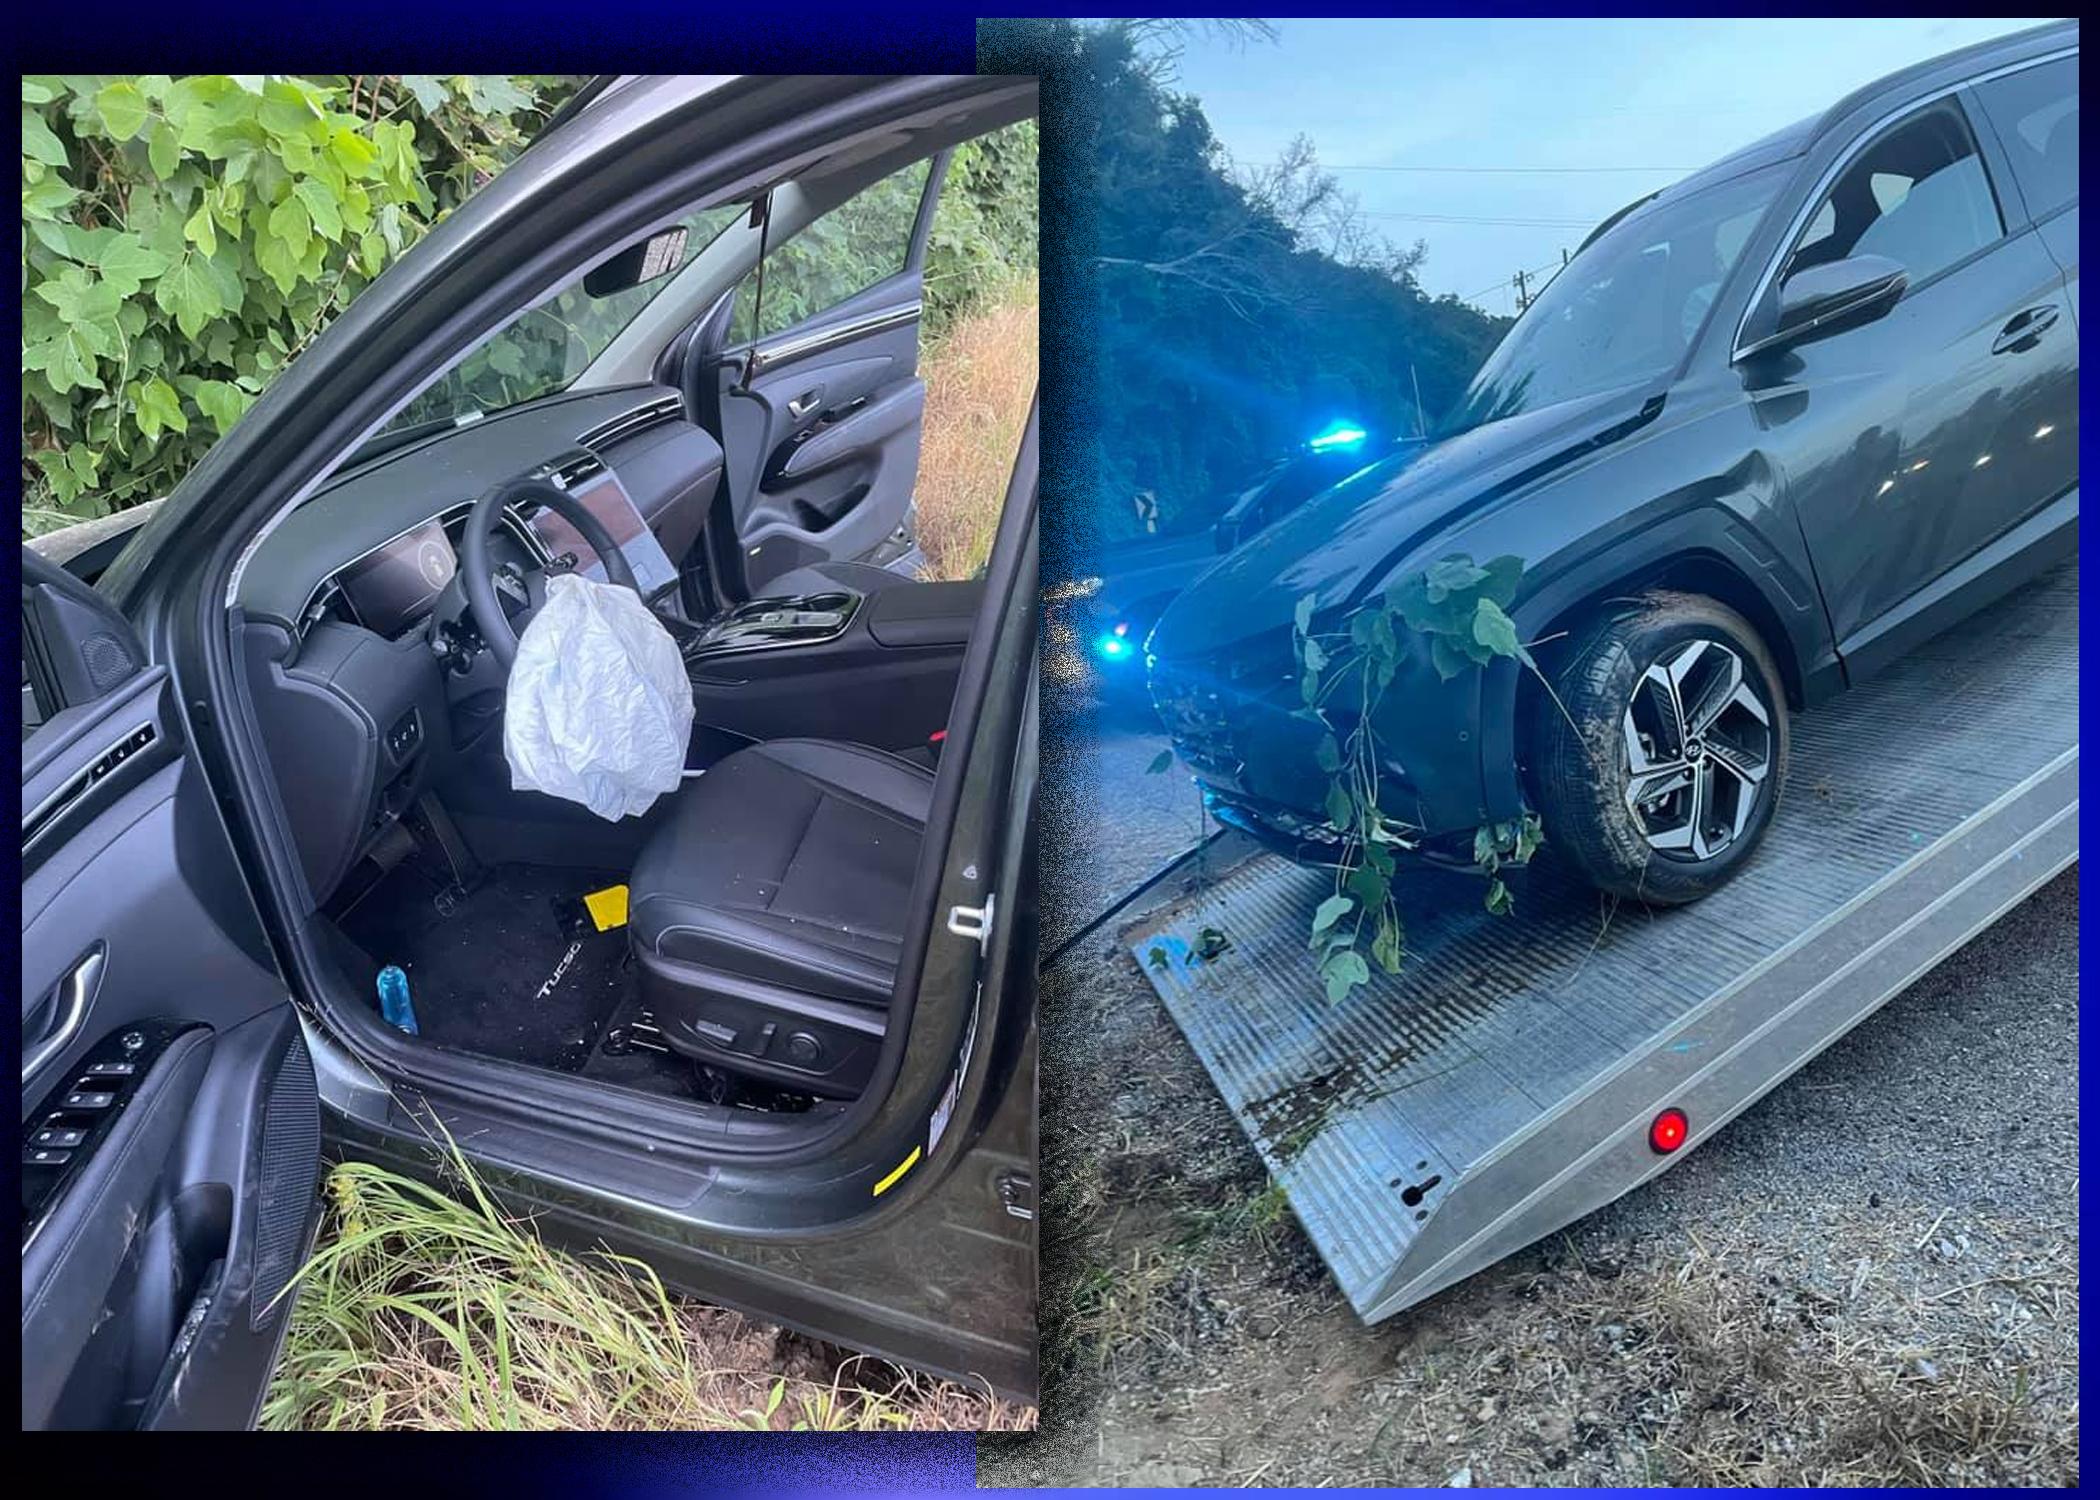 Trussville woman's car stolen during 'quick trip' inside Springville gas station